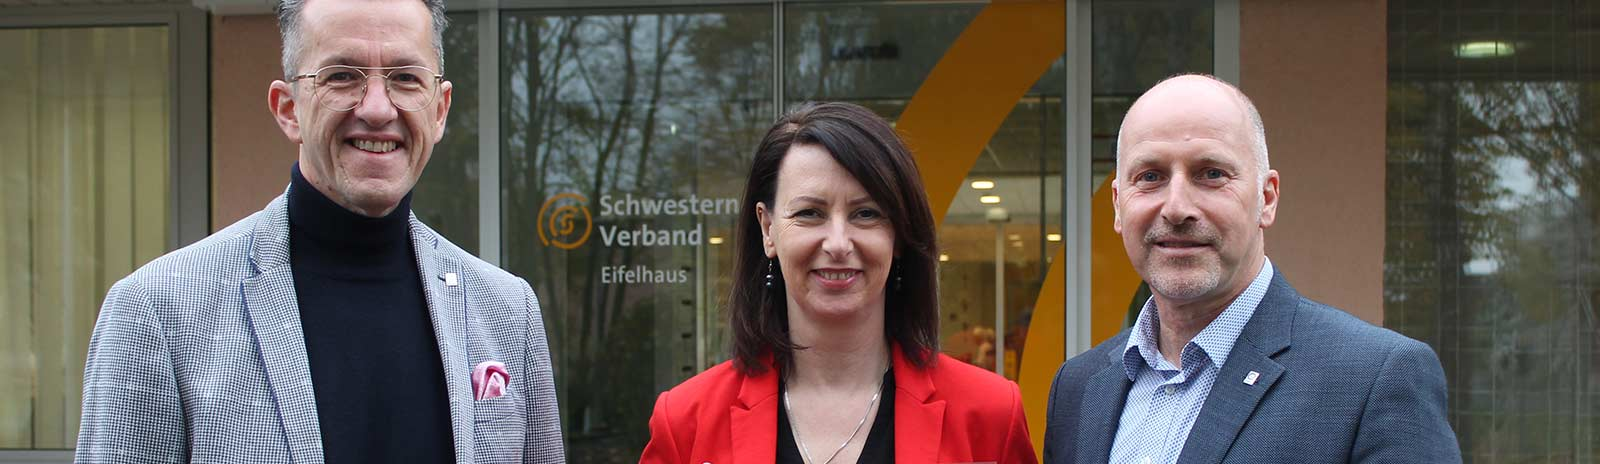 2019_11_11_Pflegeverbund_Eifel_Arbeitgebermarke_slider